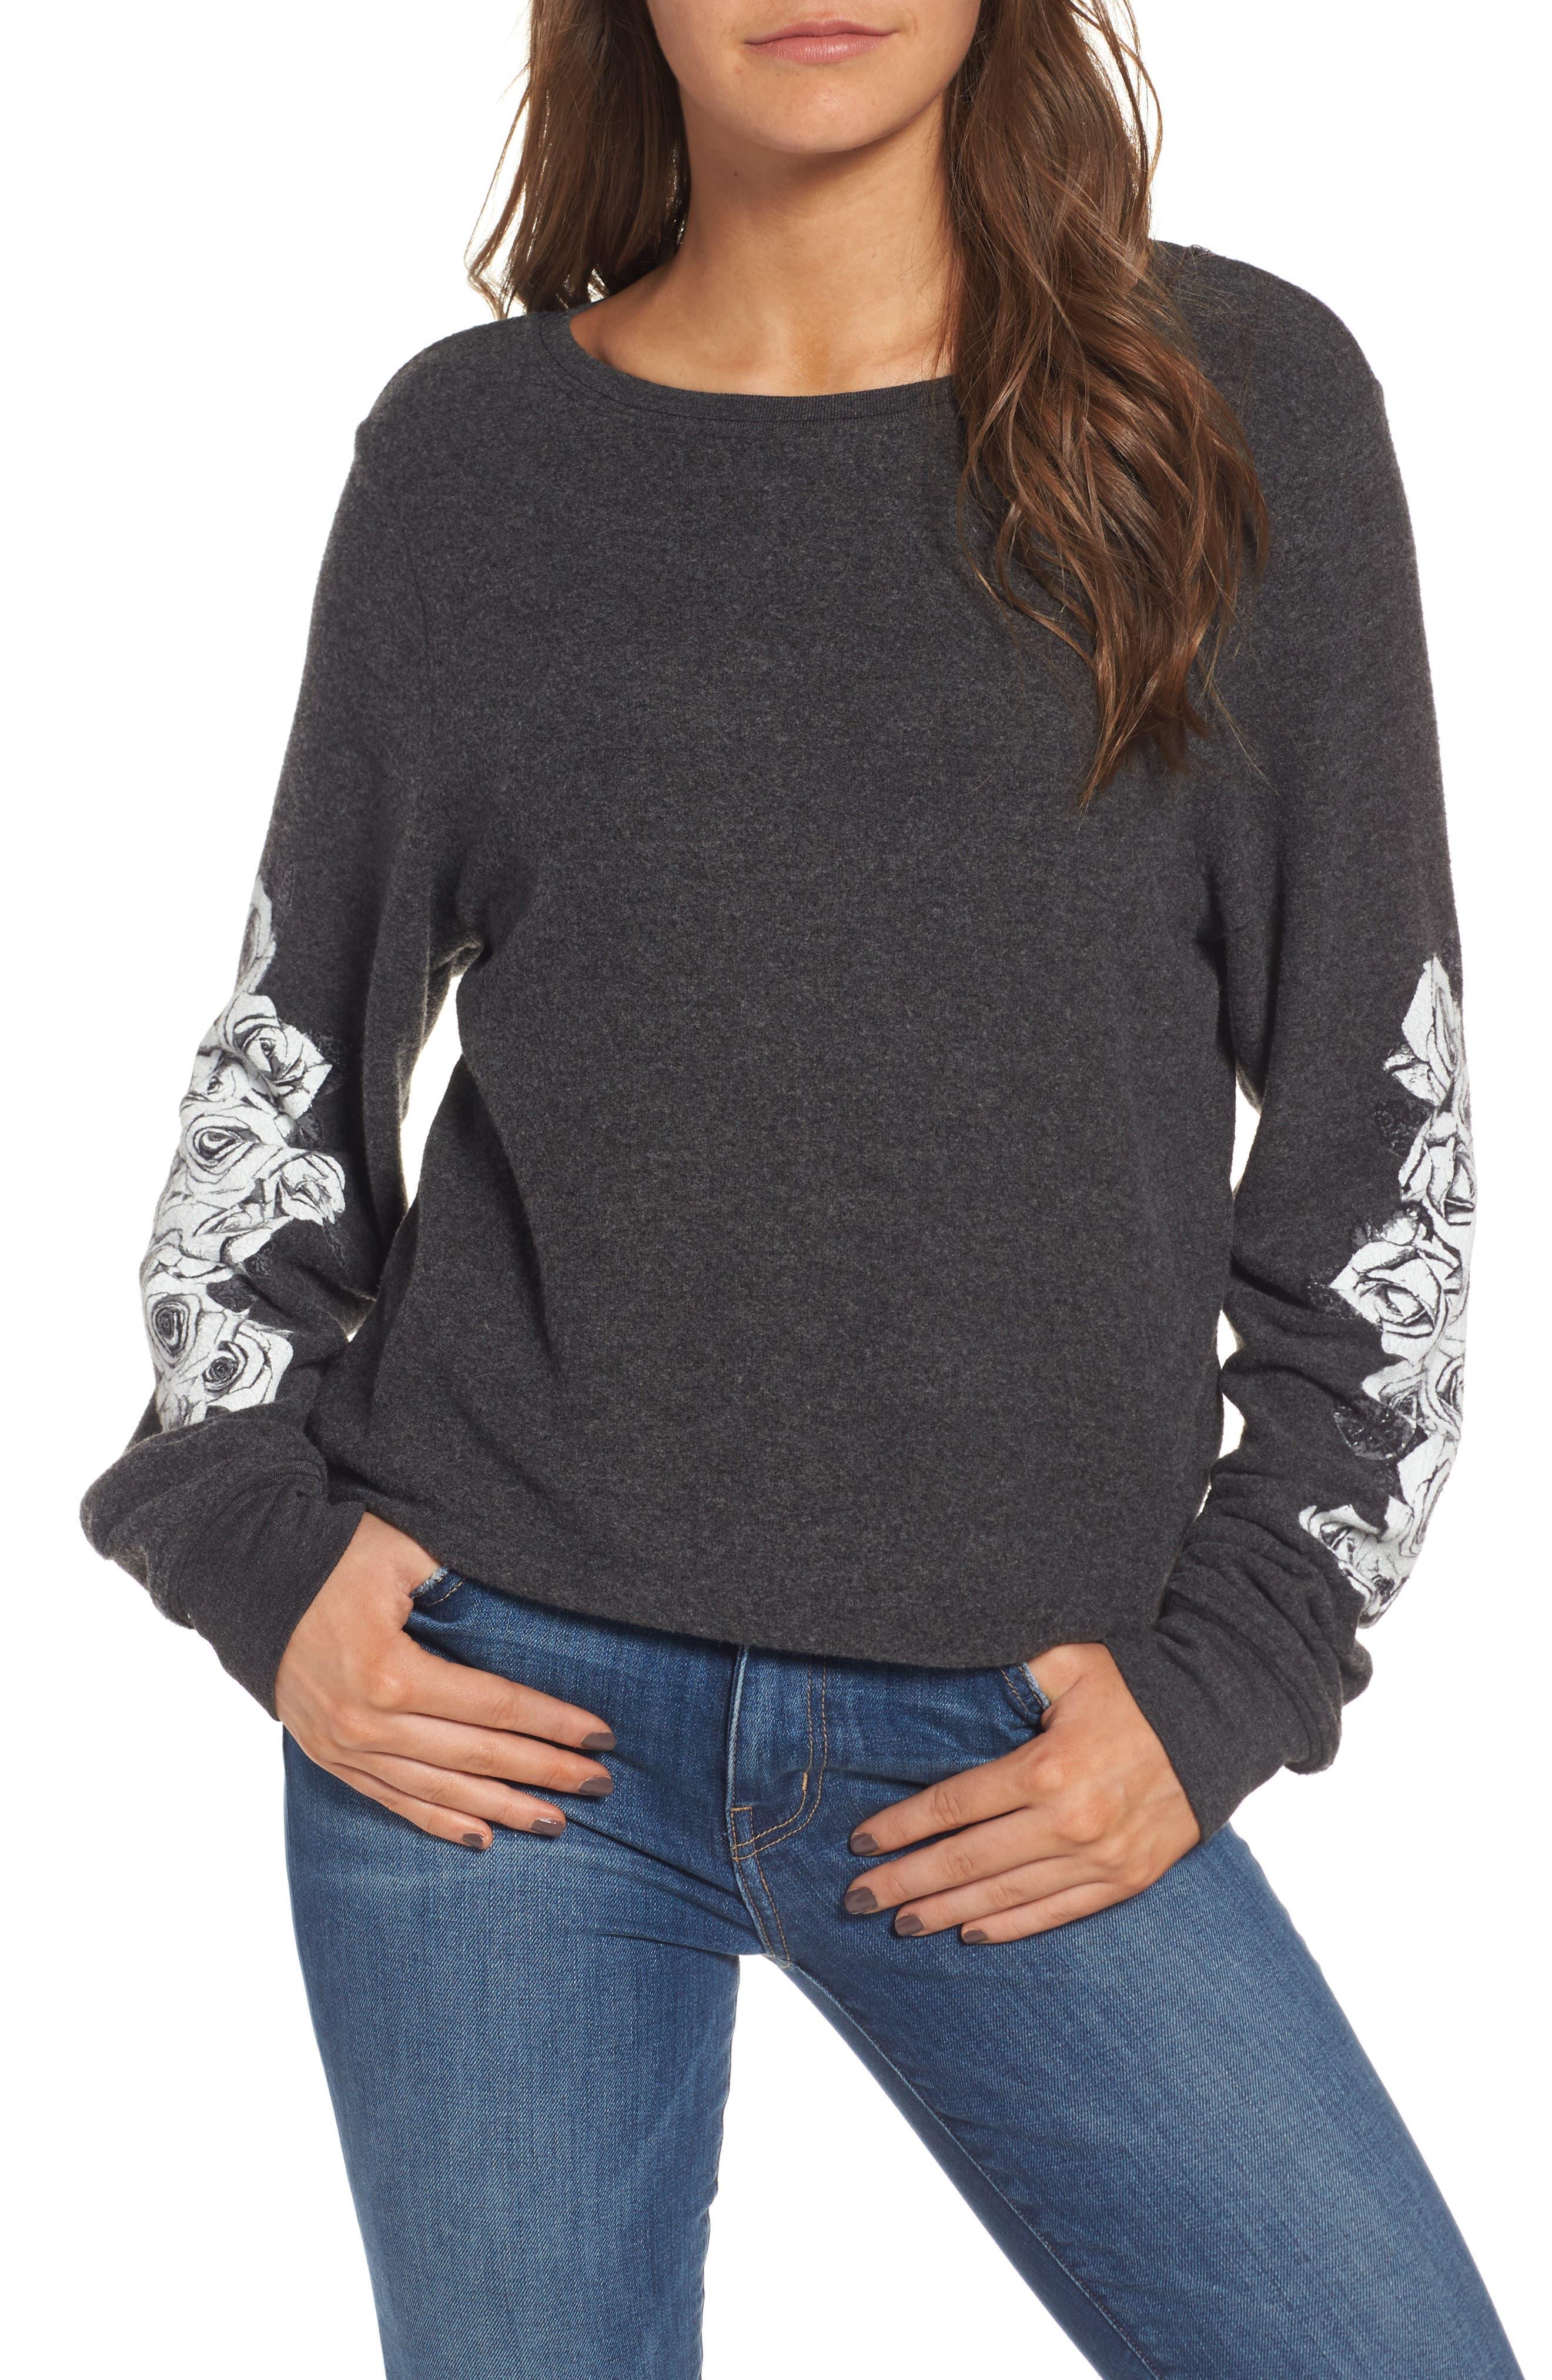 Wildfox Garden Sweatshirt